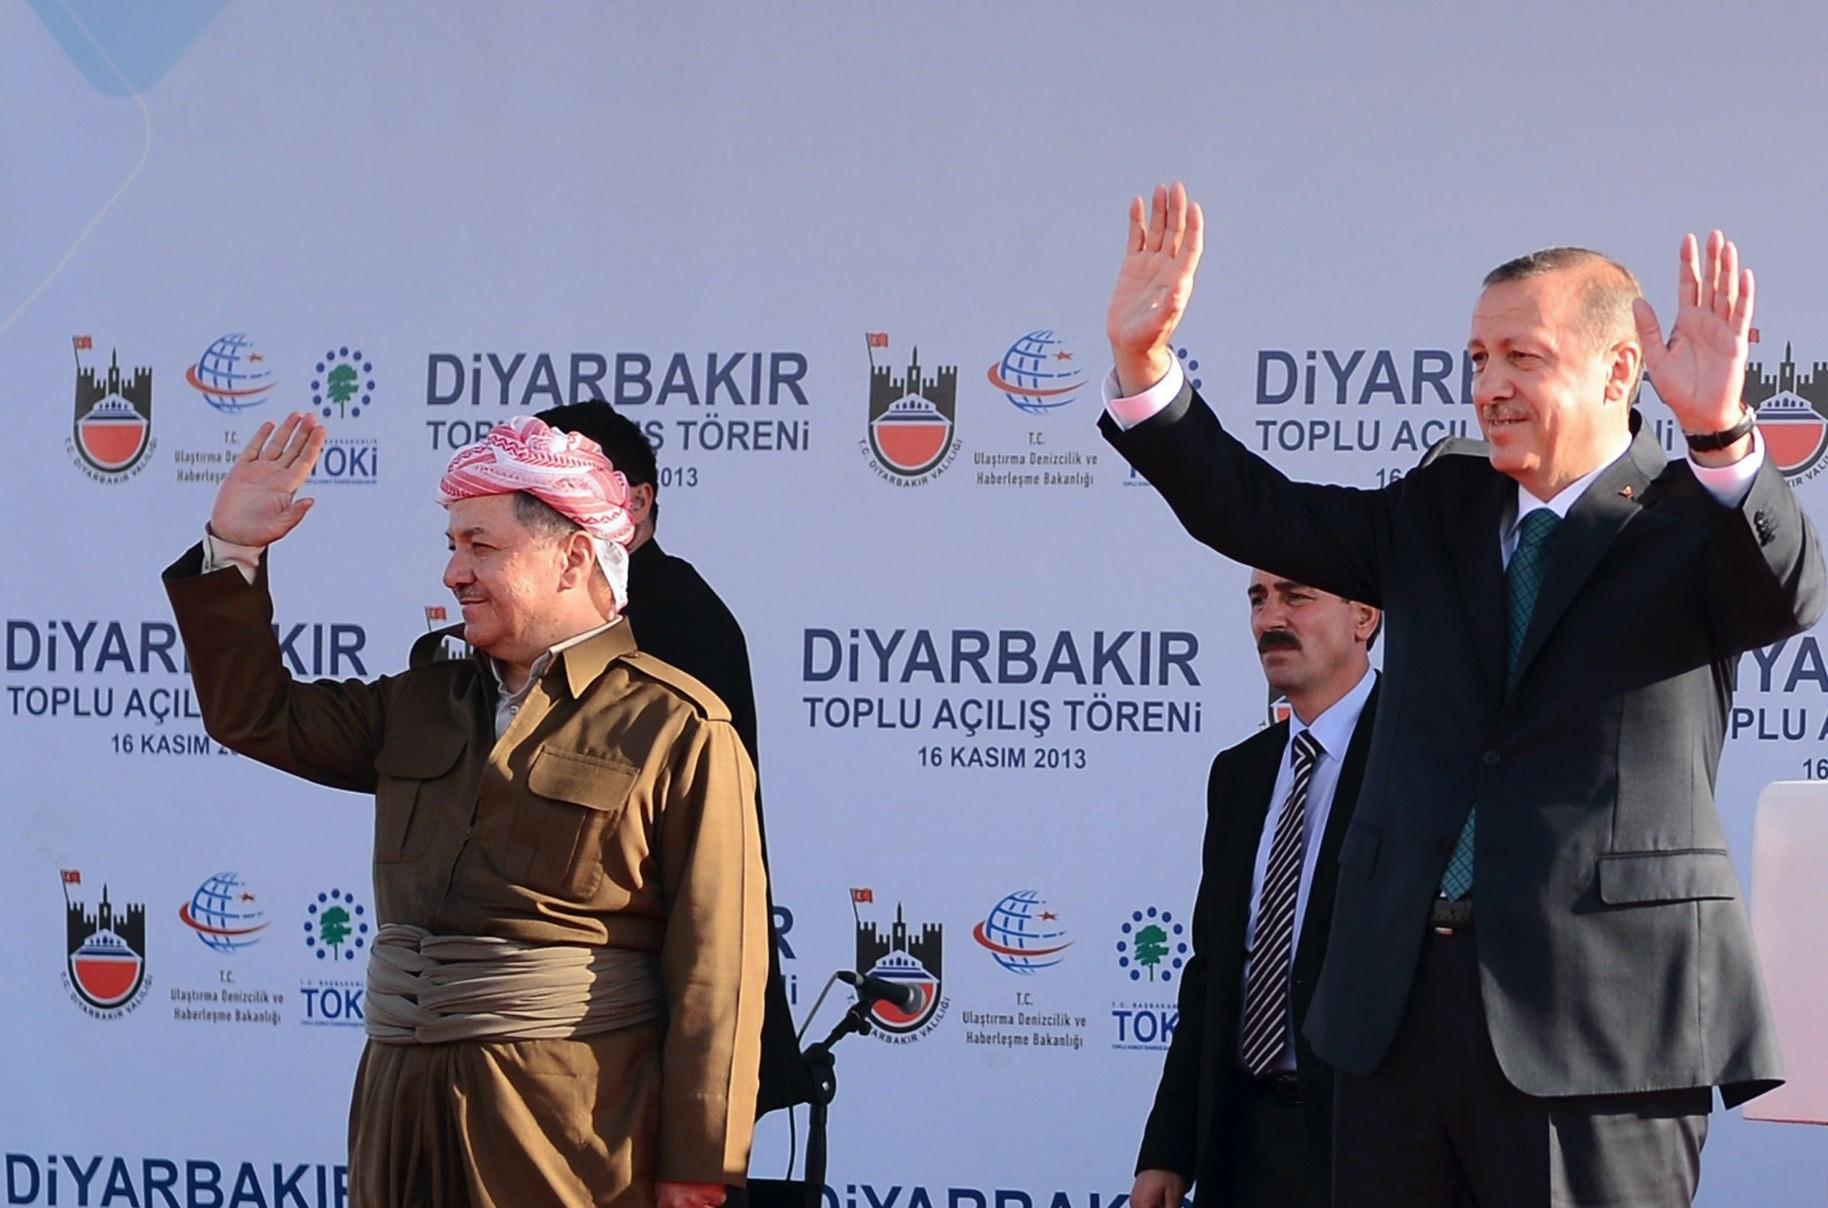 President Recep Tayyip Erdou011fan and President Masoud Barzani of the Iraqi Kurdistan Regional Government (KRG), greet the crowd during an opening in Diyarbaku0131r on Nov. 16, 2013.